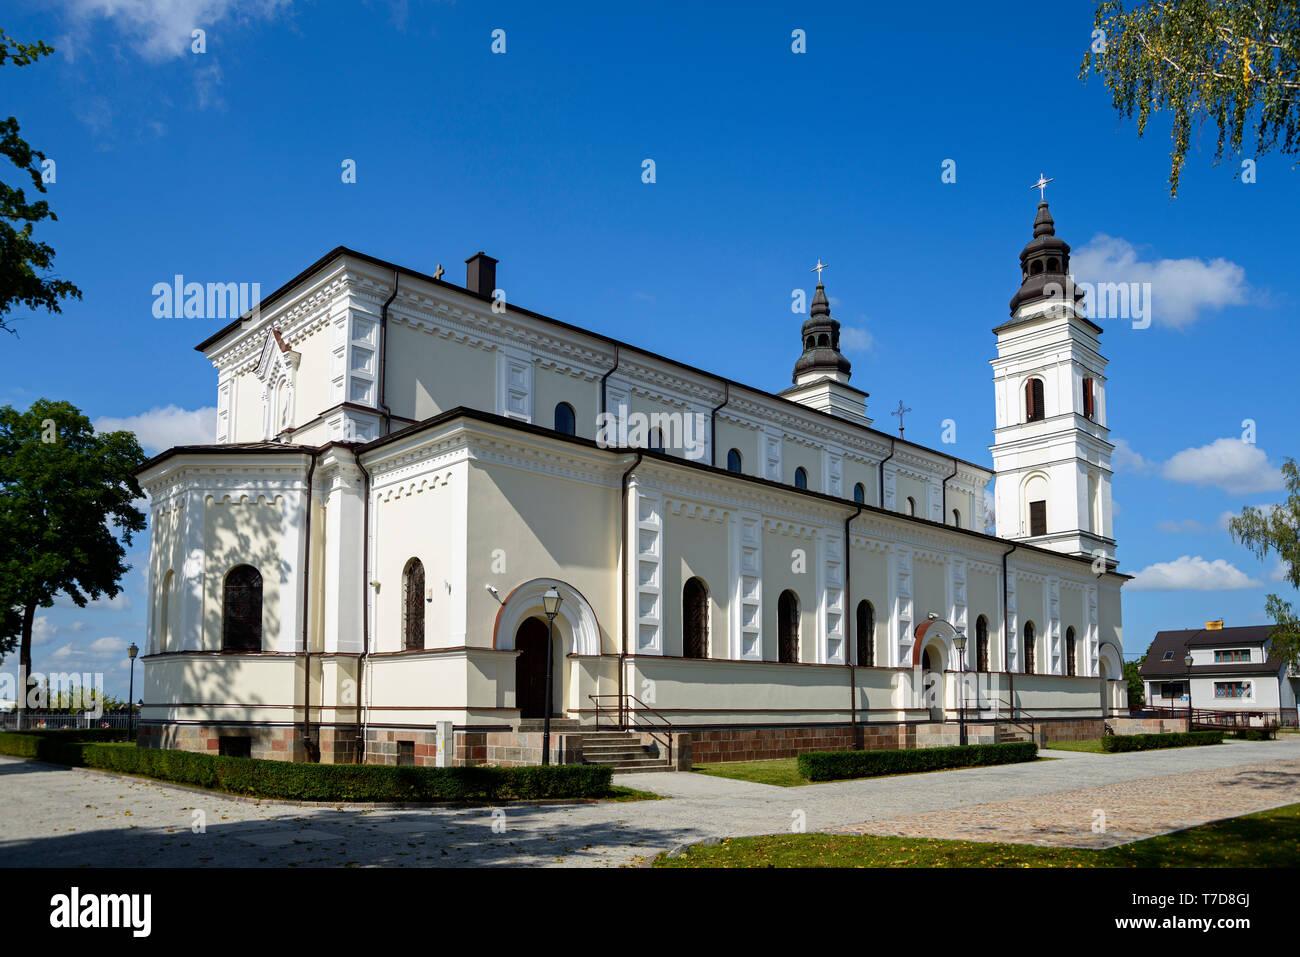 Church, Suwalki, Podlasie, Poland Stock Photo